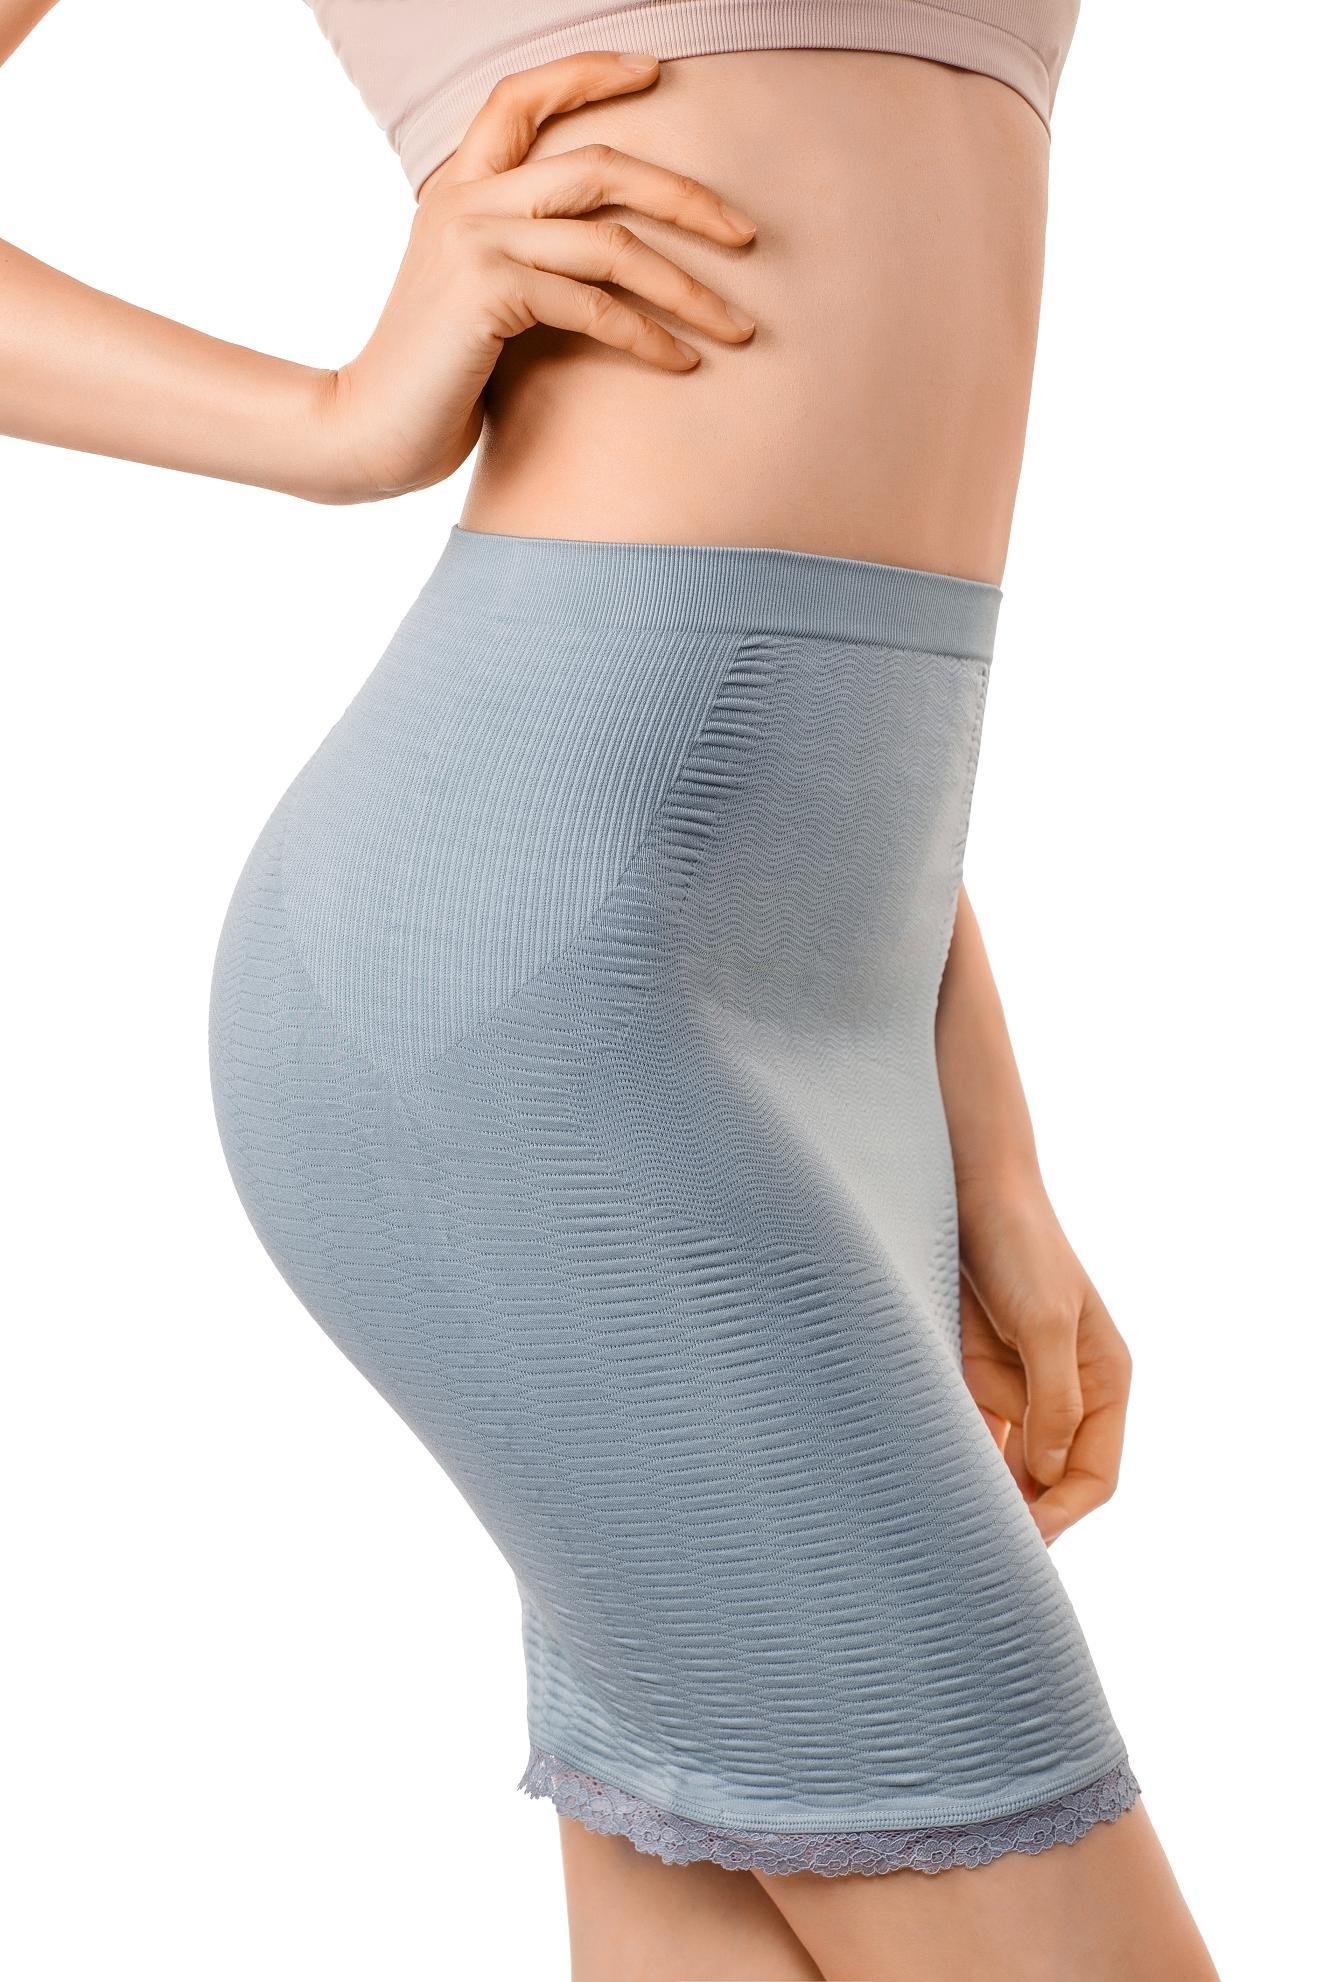 +MD Women's Shapewear Slip High Waisted Body Shaper Butt Lifter Firm Tummy Control Half Slip for Under Dresses